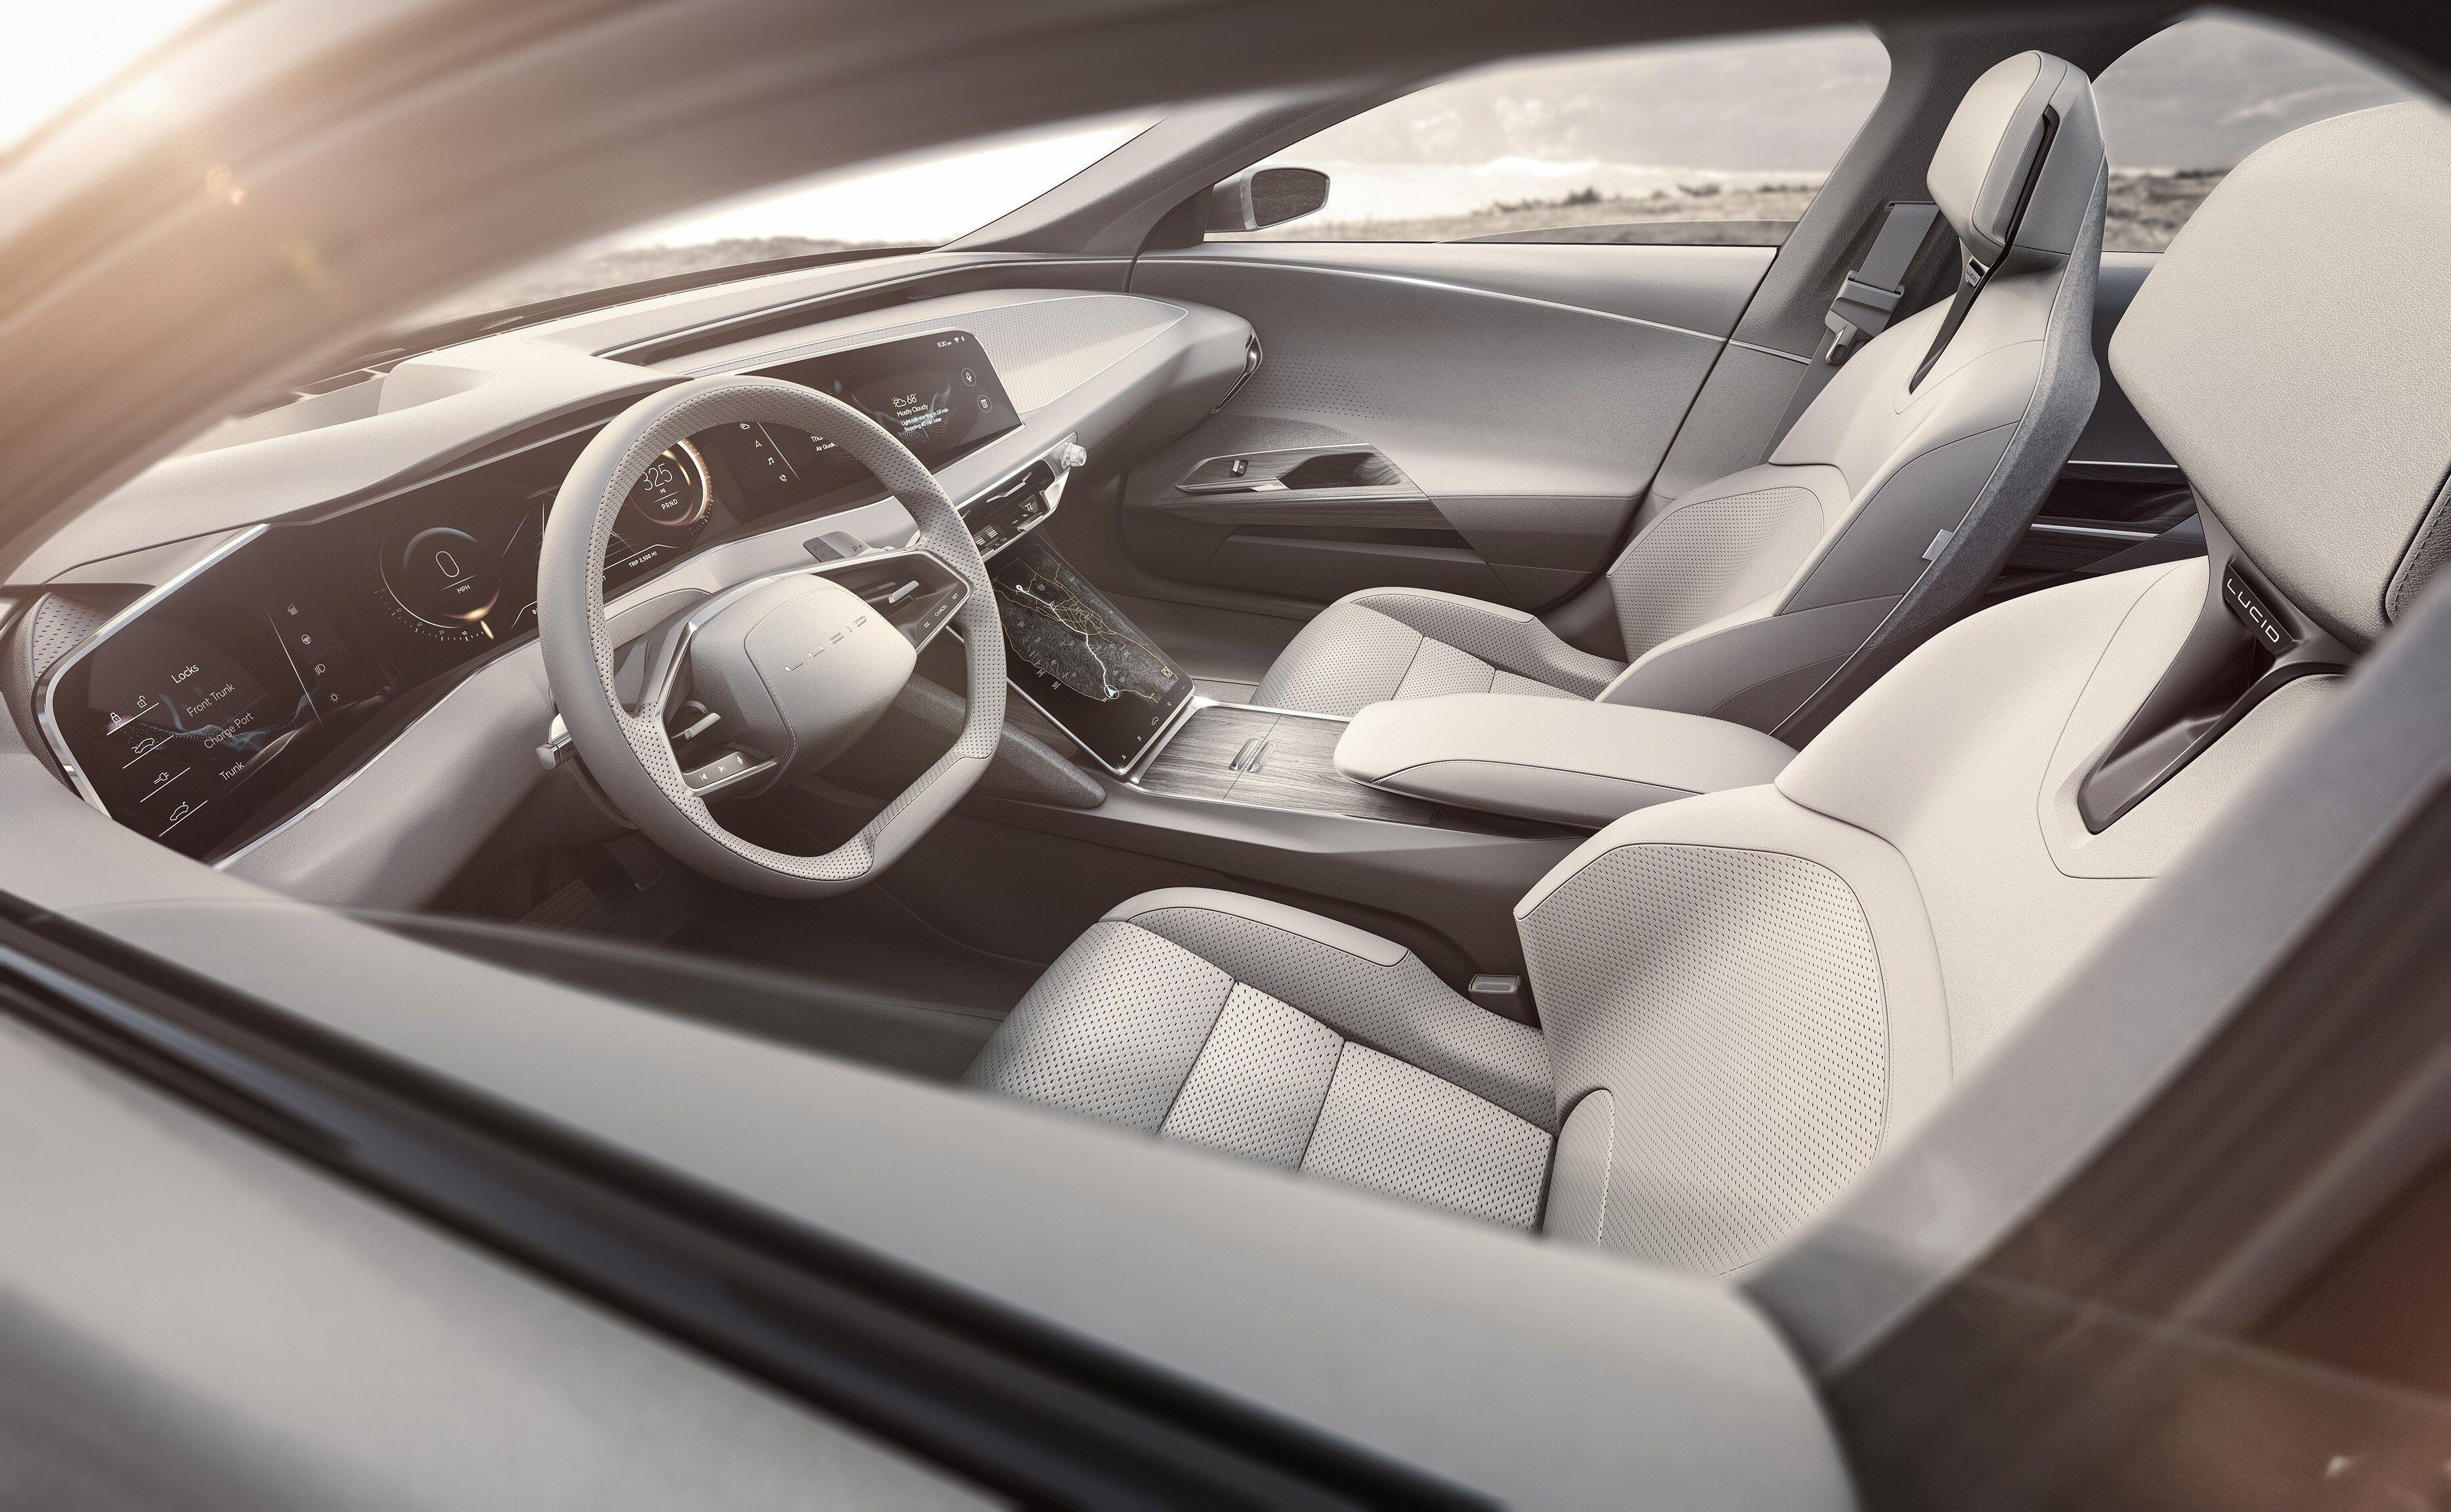 3733x2303 Lucid Air 4k Hd Wallpaper Desktop Car Interior Sketch Luxury Cars Air Car